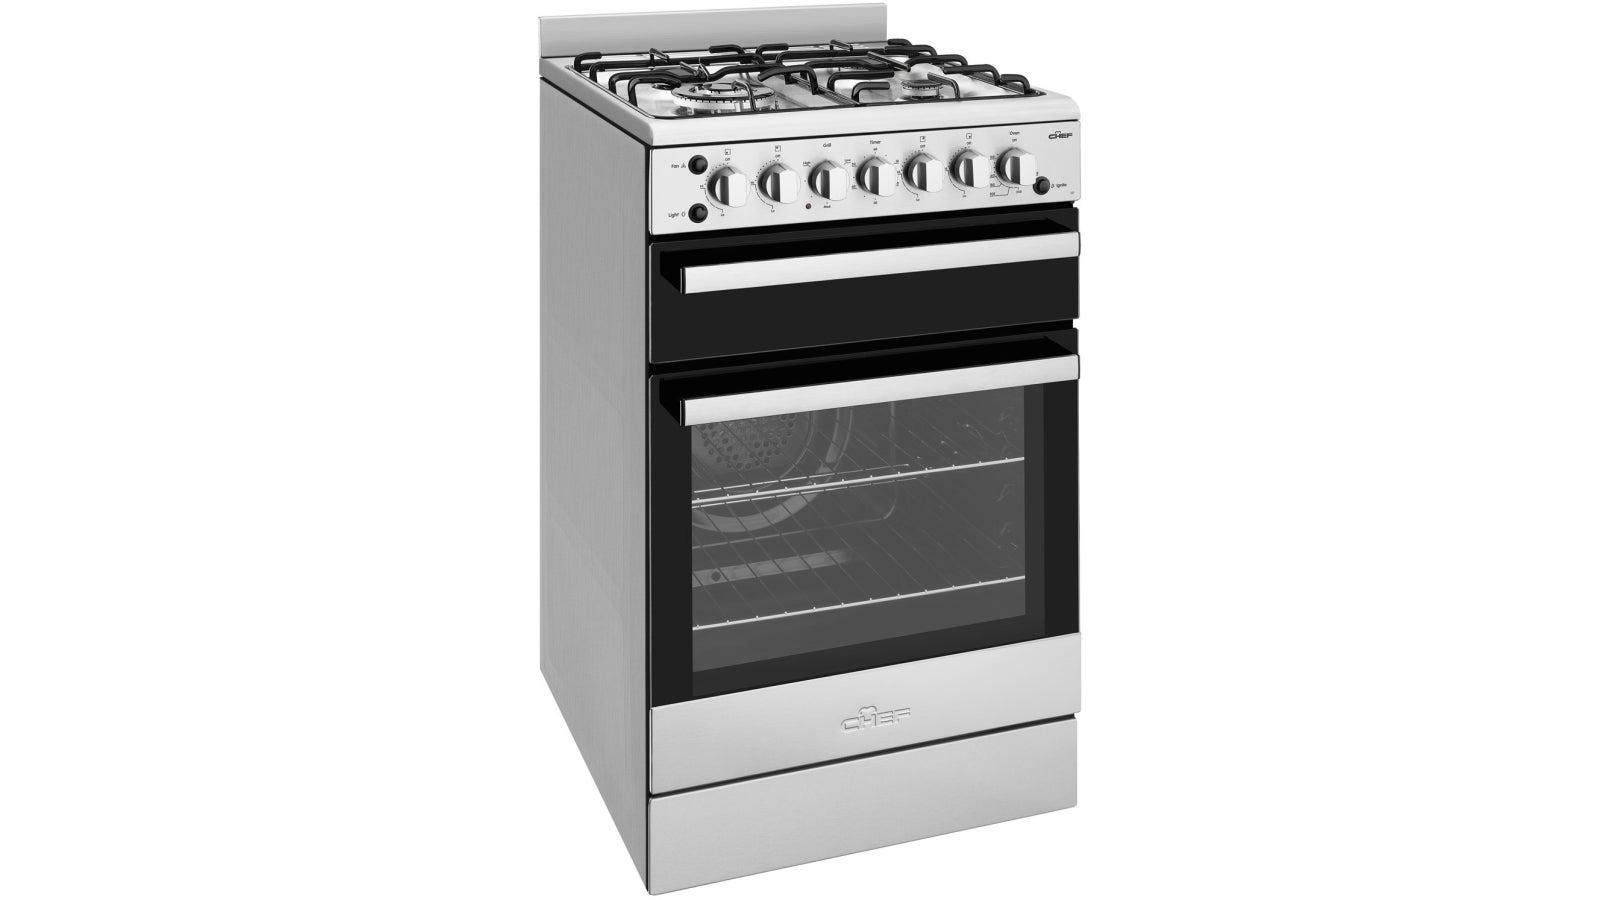 Chef CFG517SB Oven